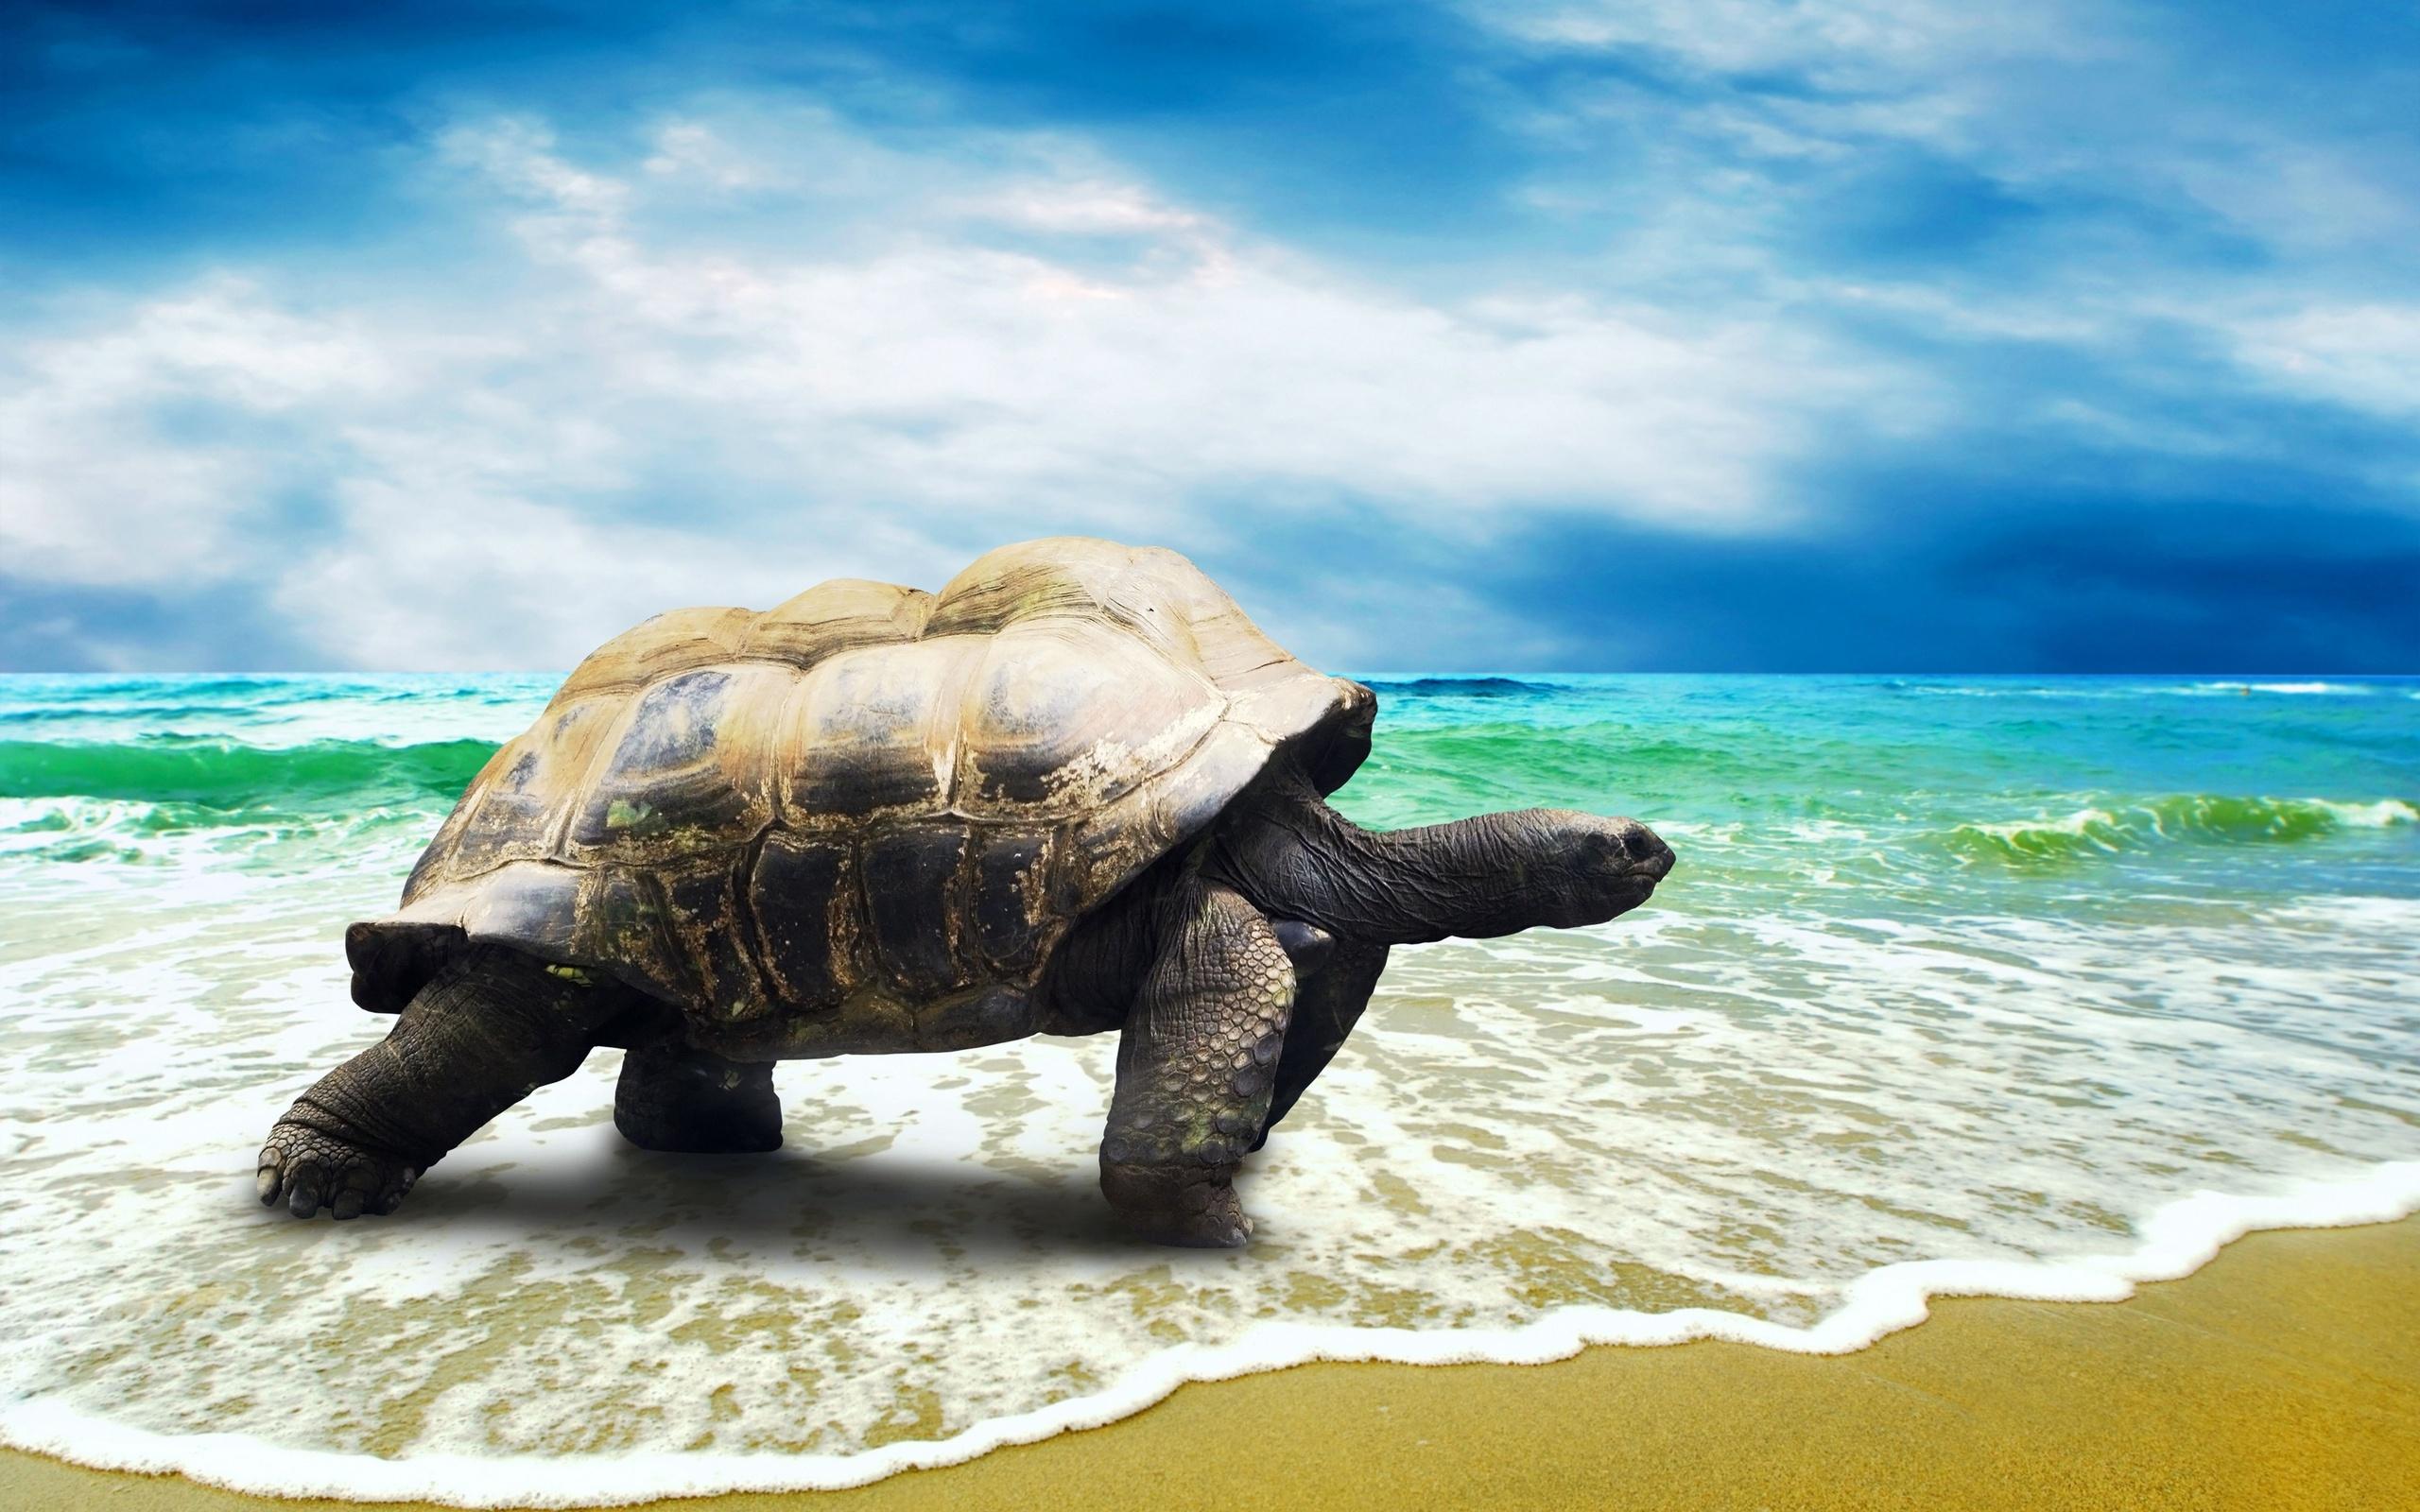 HD Turtle Wallpaper Download 109045 Wallpaper Animal 2560x1600